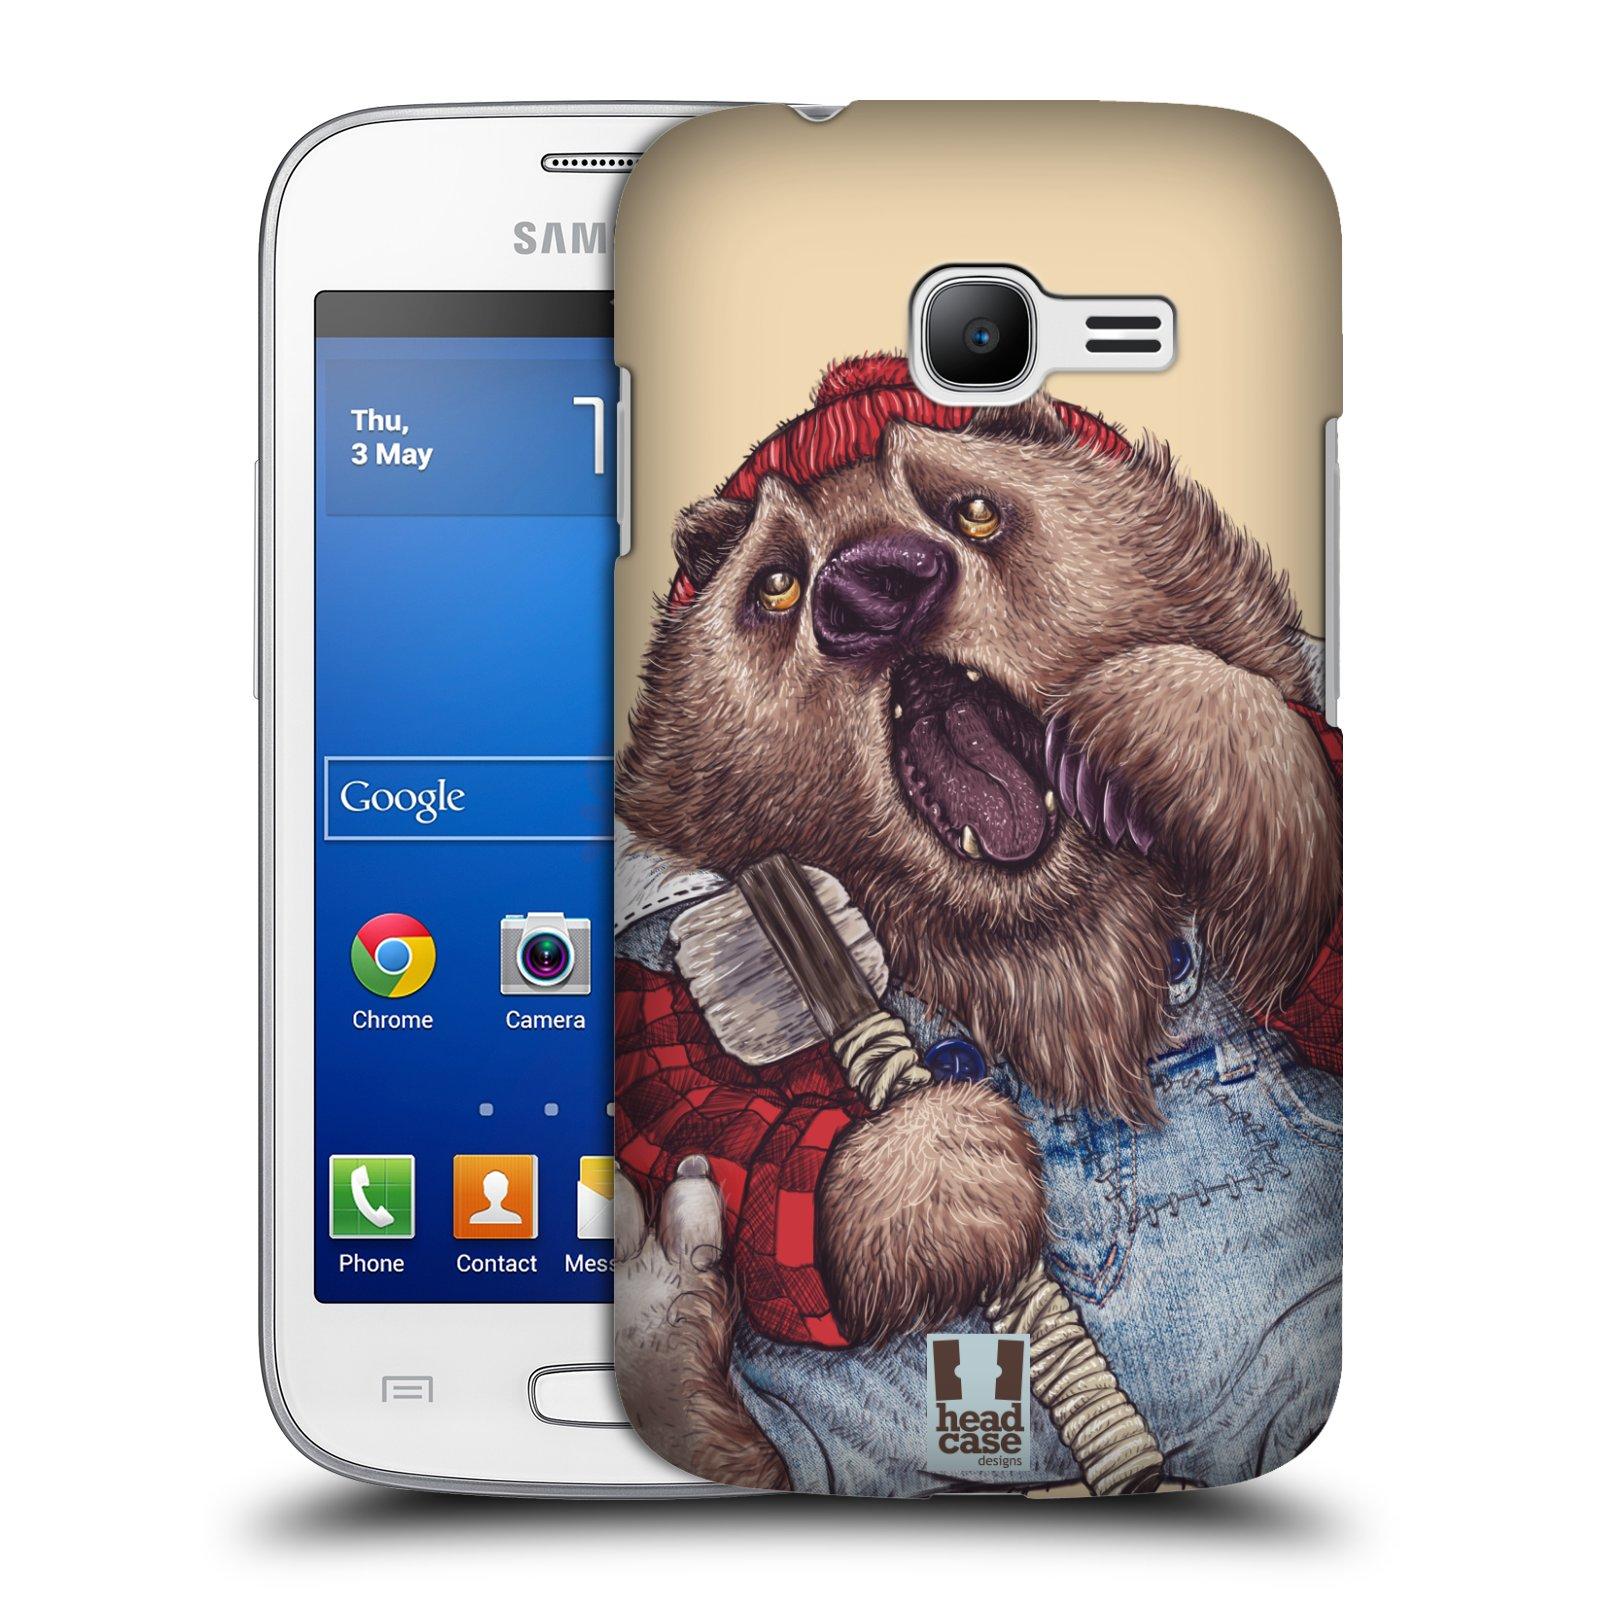 HEAD CASE plastový obal na mobil SAMSUNG GALAXY Star Pro S7260/S7262 DUOS vzor Kreslená zvířátka medvěd